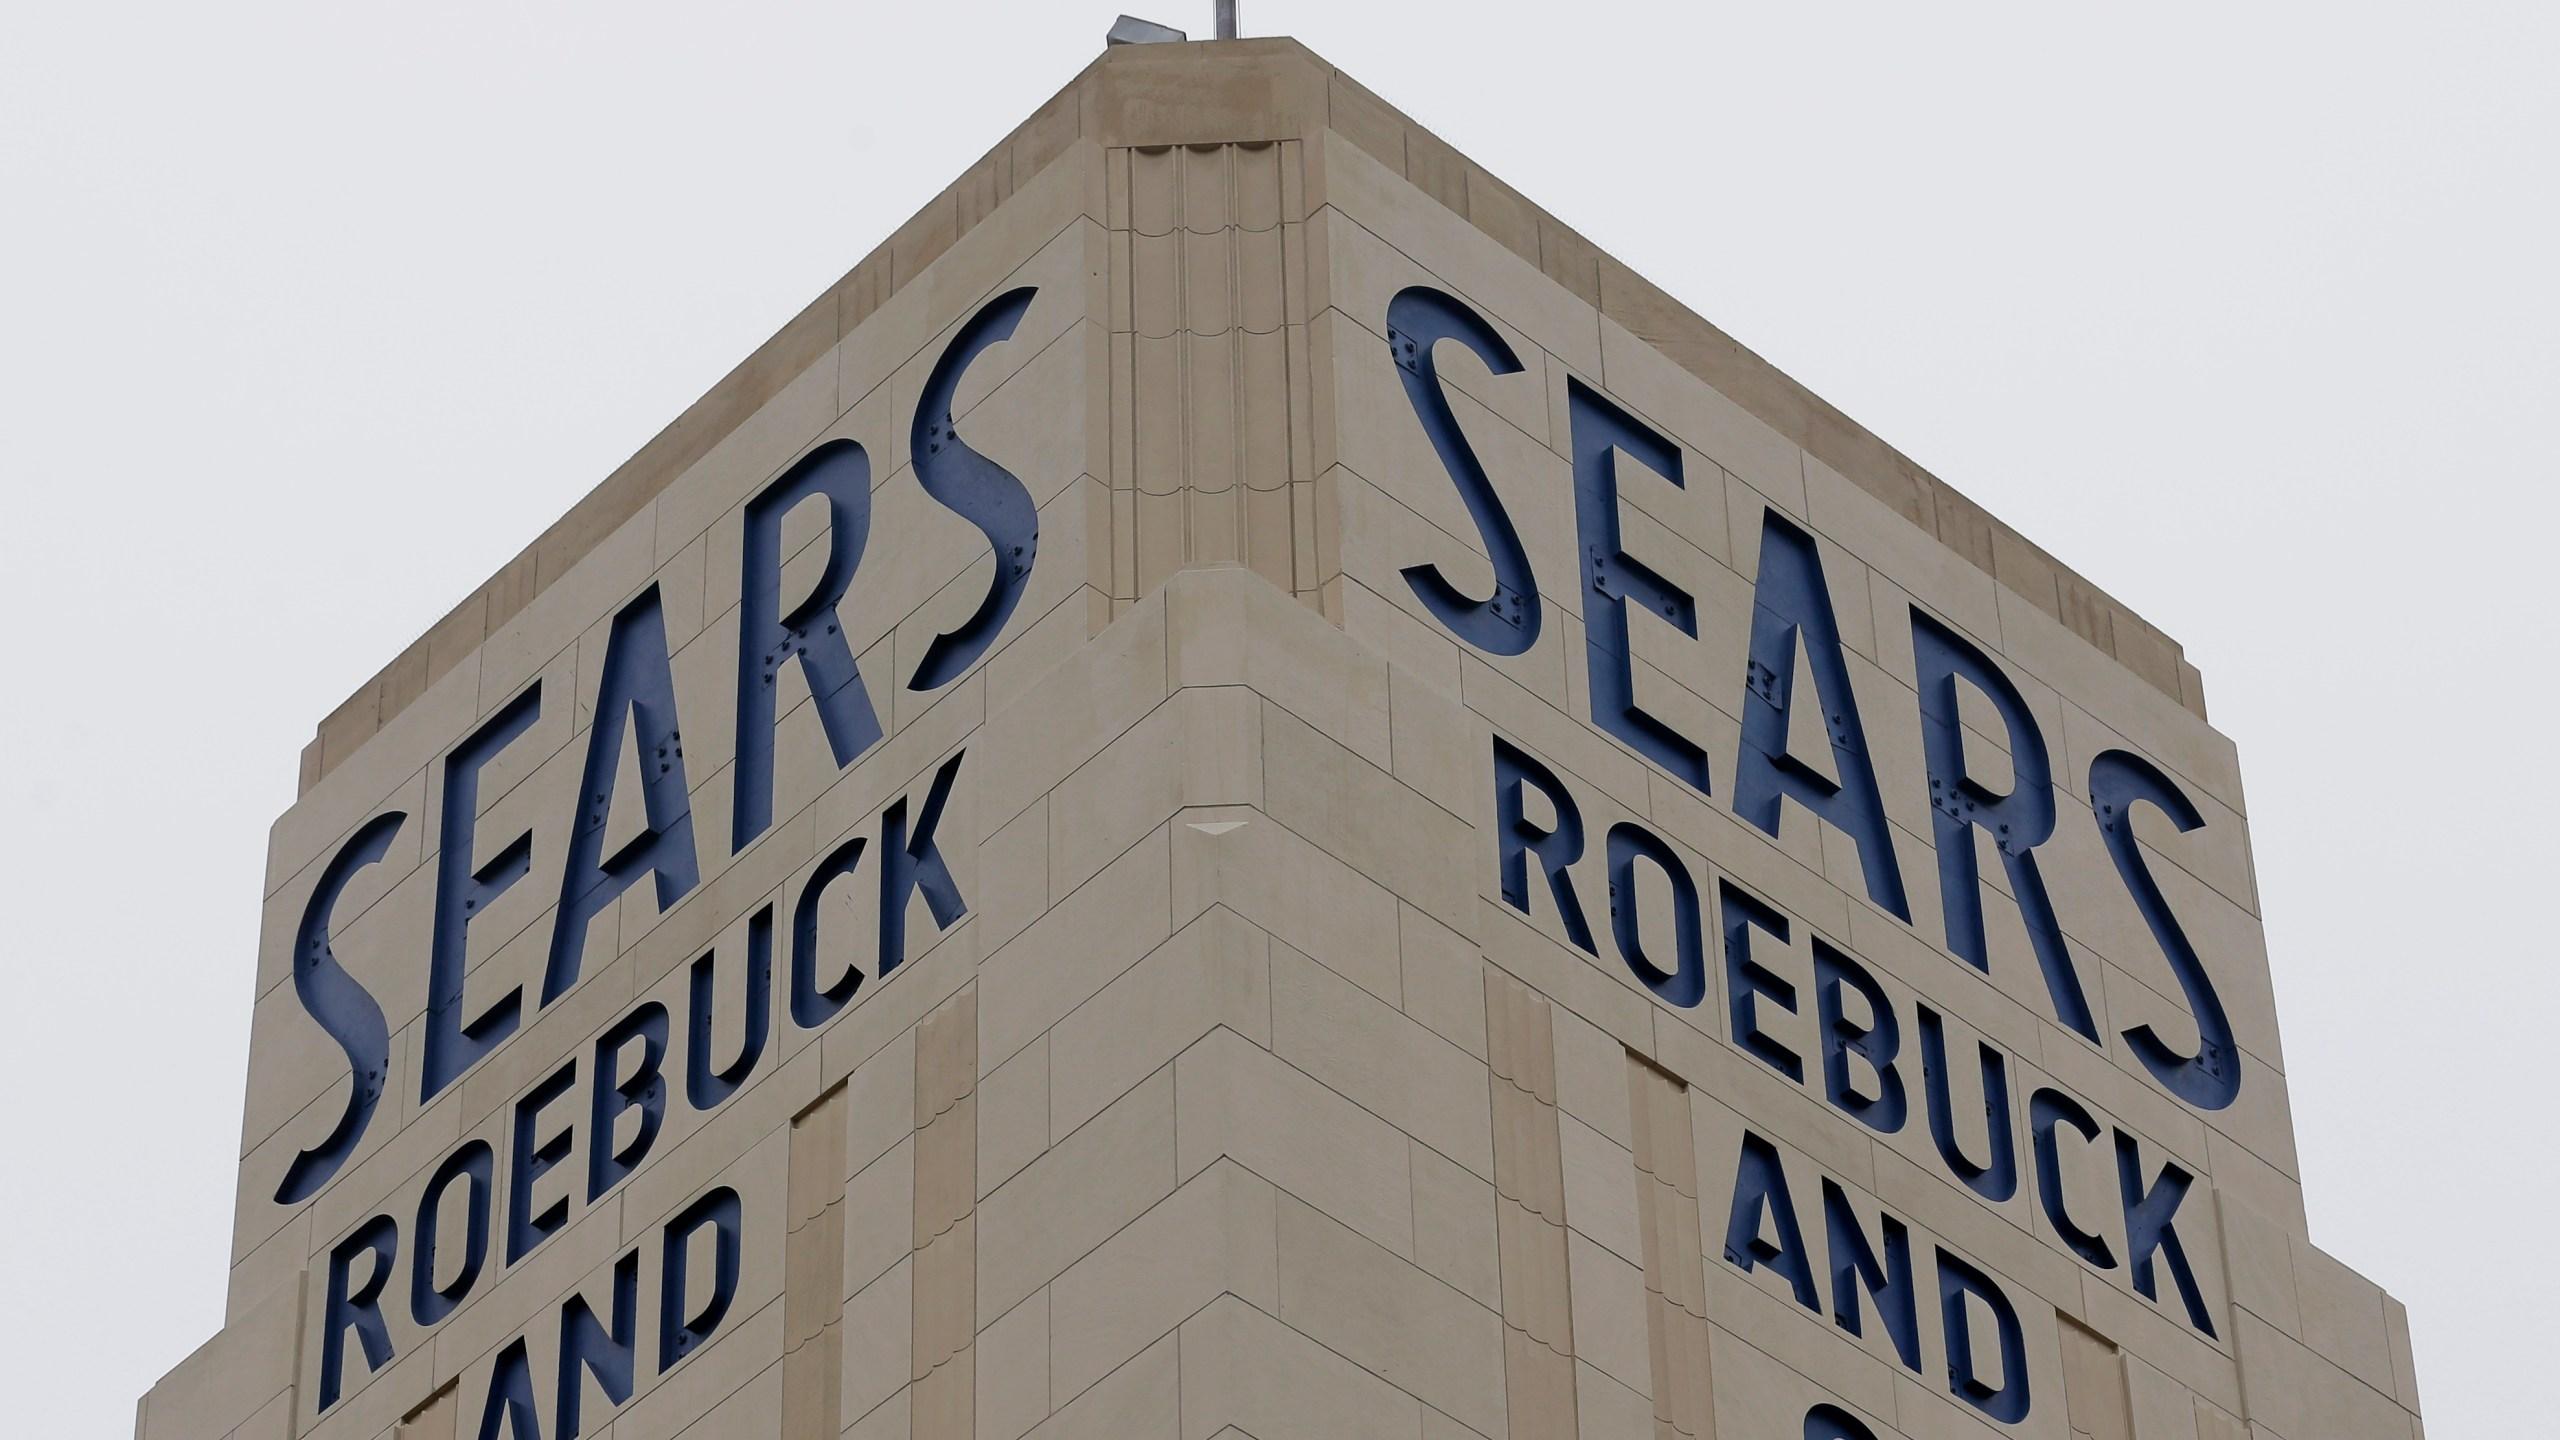 Sears_Survival_99037-159532.jpg26664907